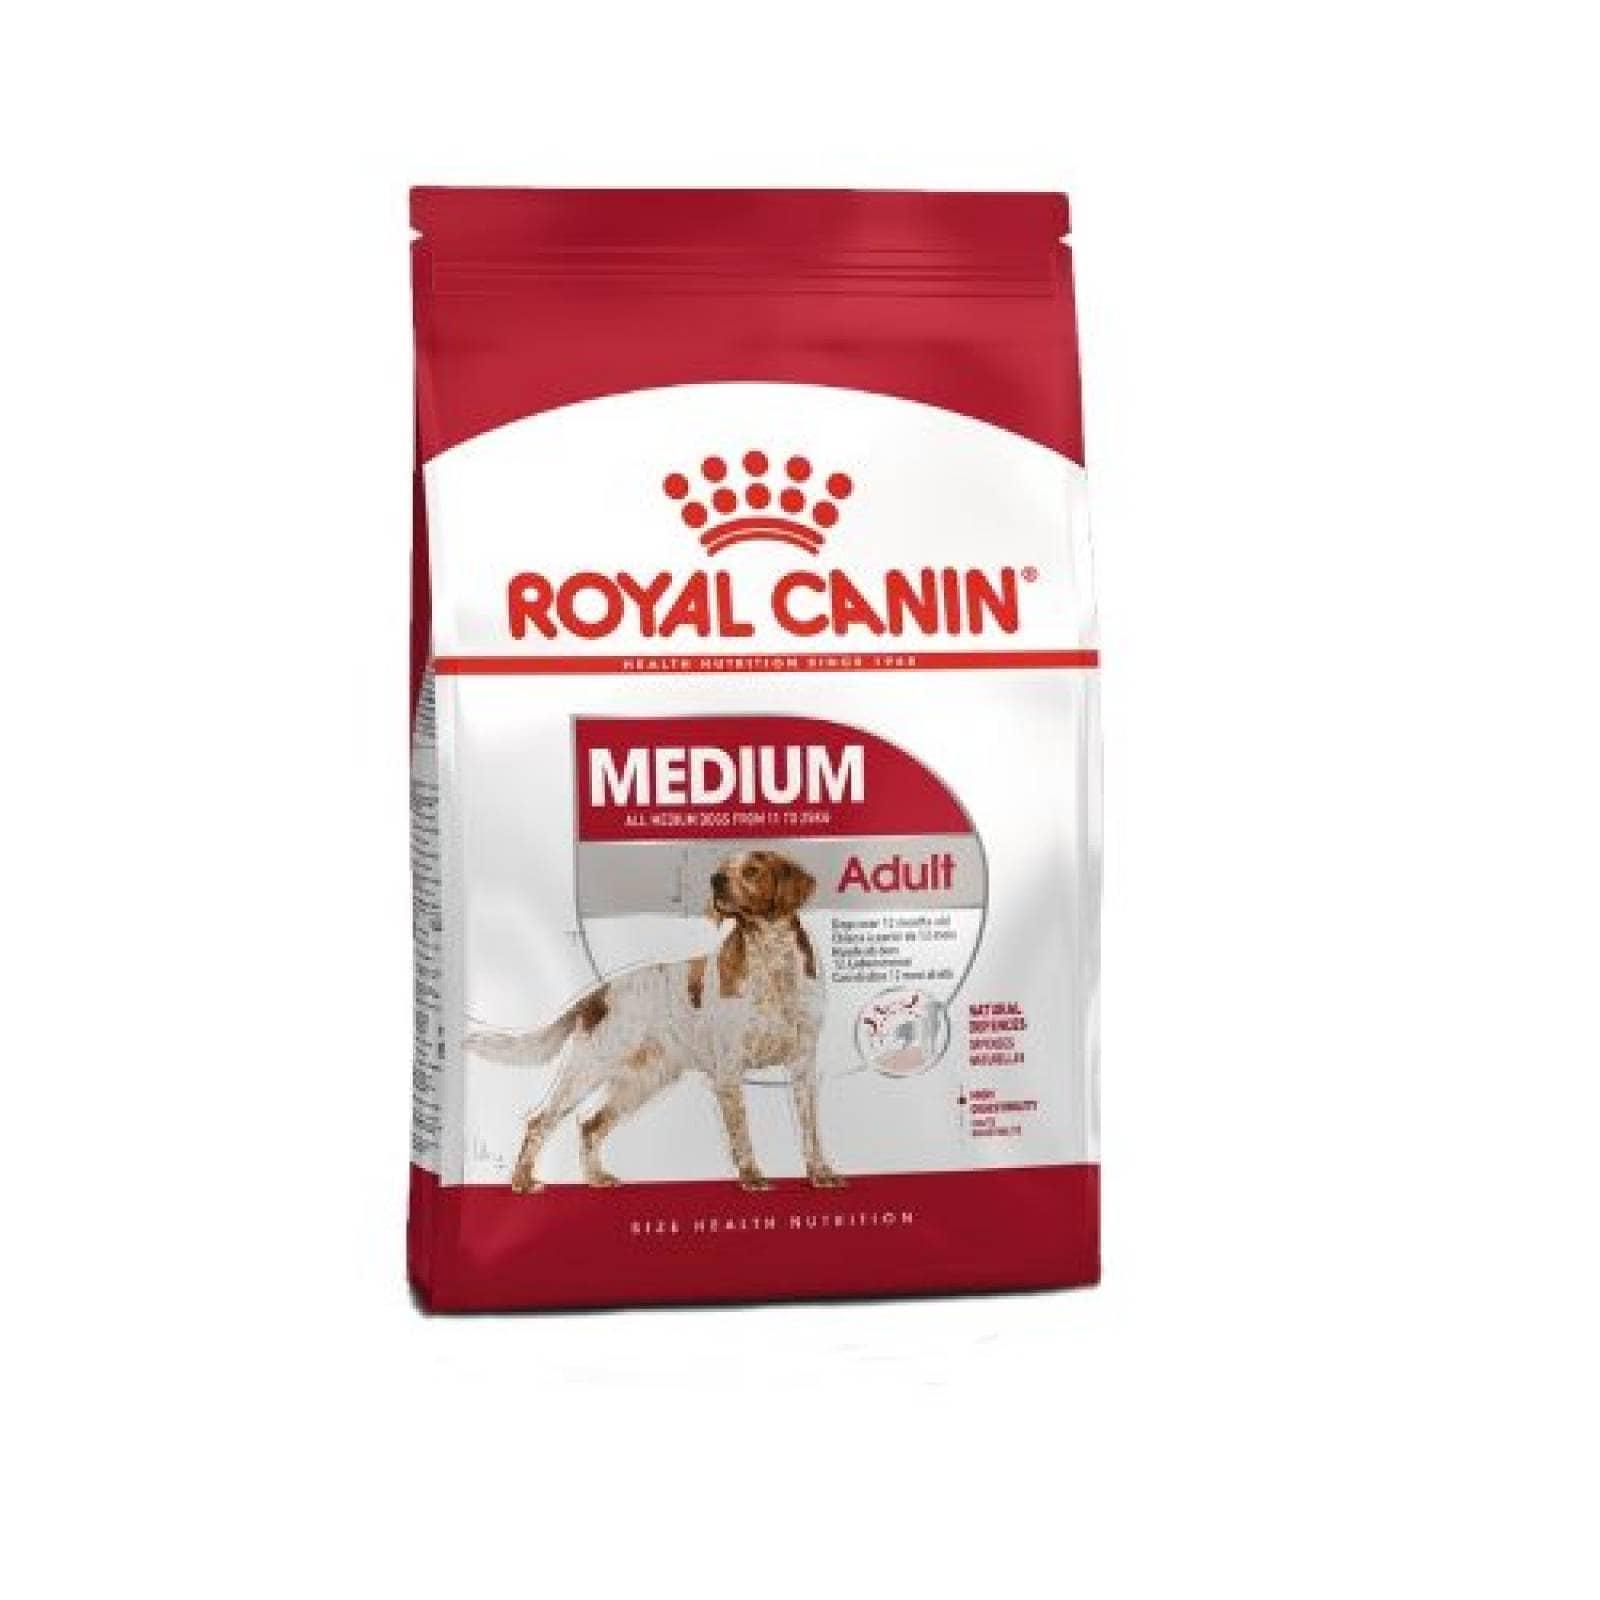 Croquetas Royal Canin Adult Medium 13.6kg